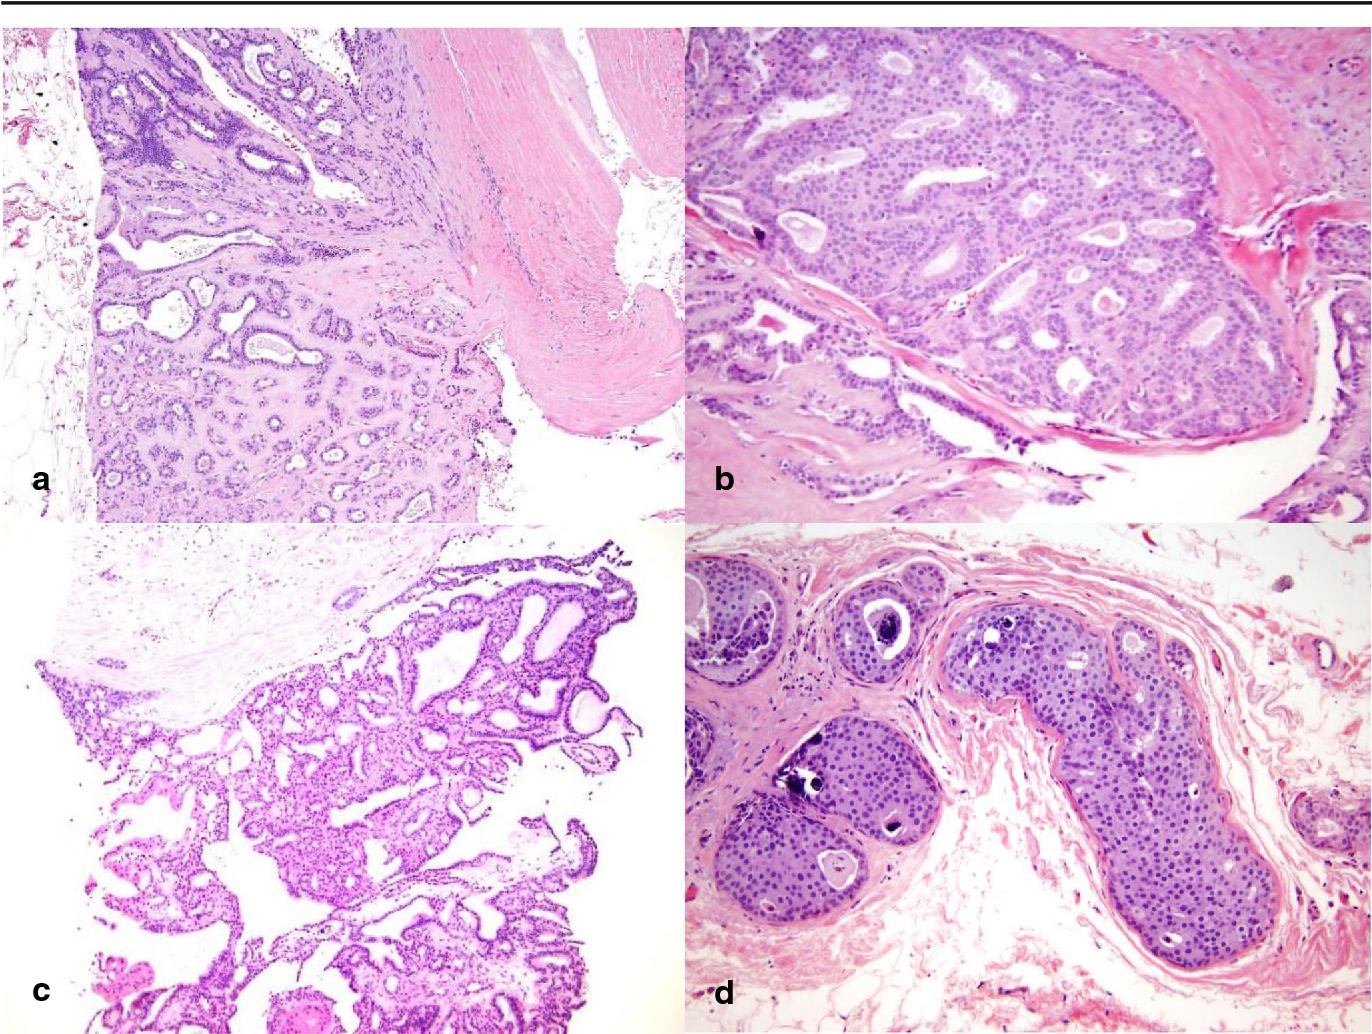 intraductal papilloma carcinoma in situ